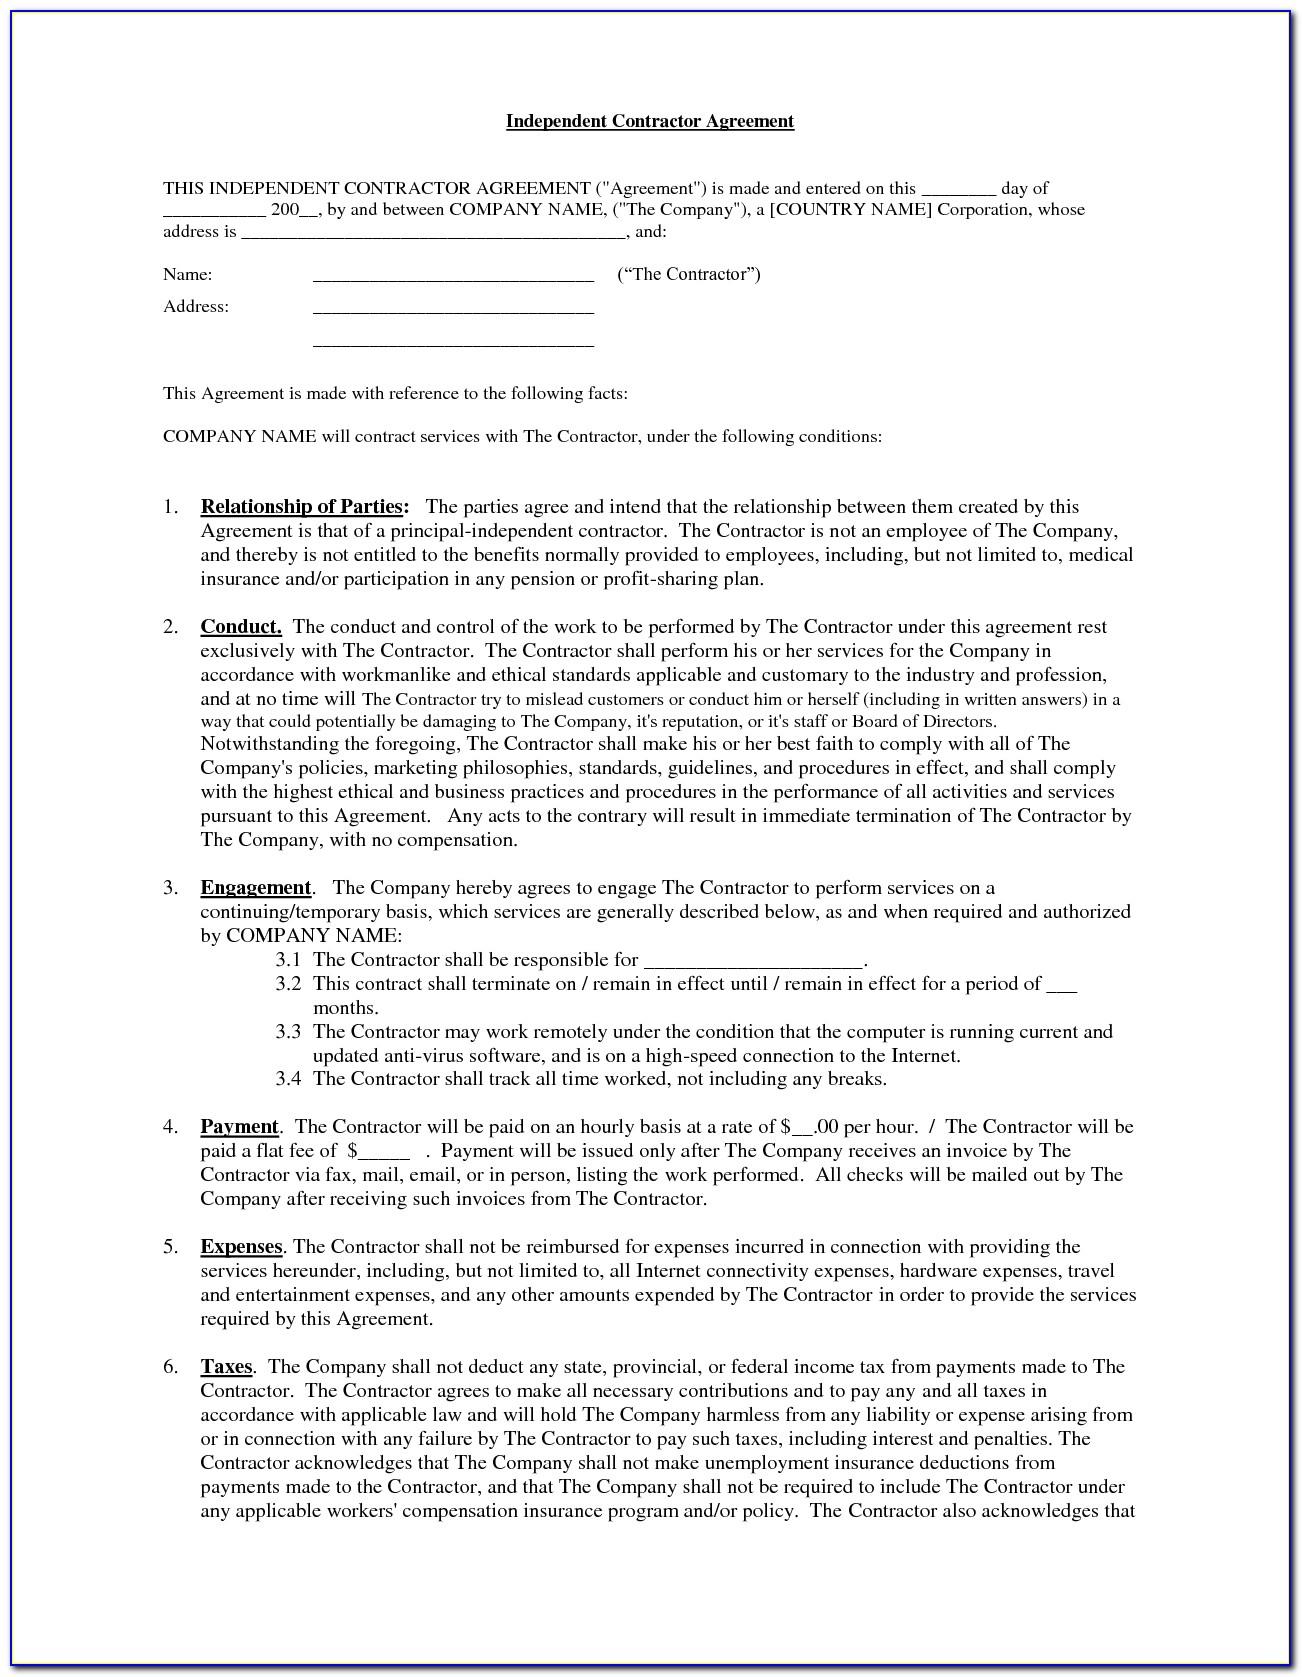 Real Estate Broker Independent Contractor Agreement